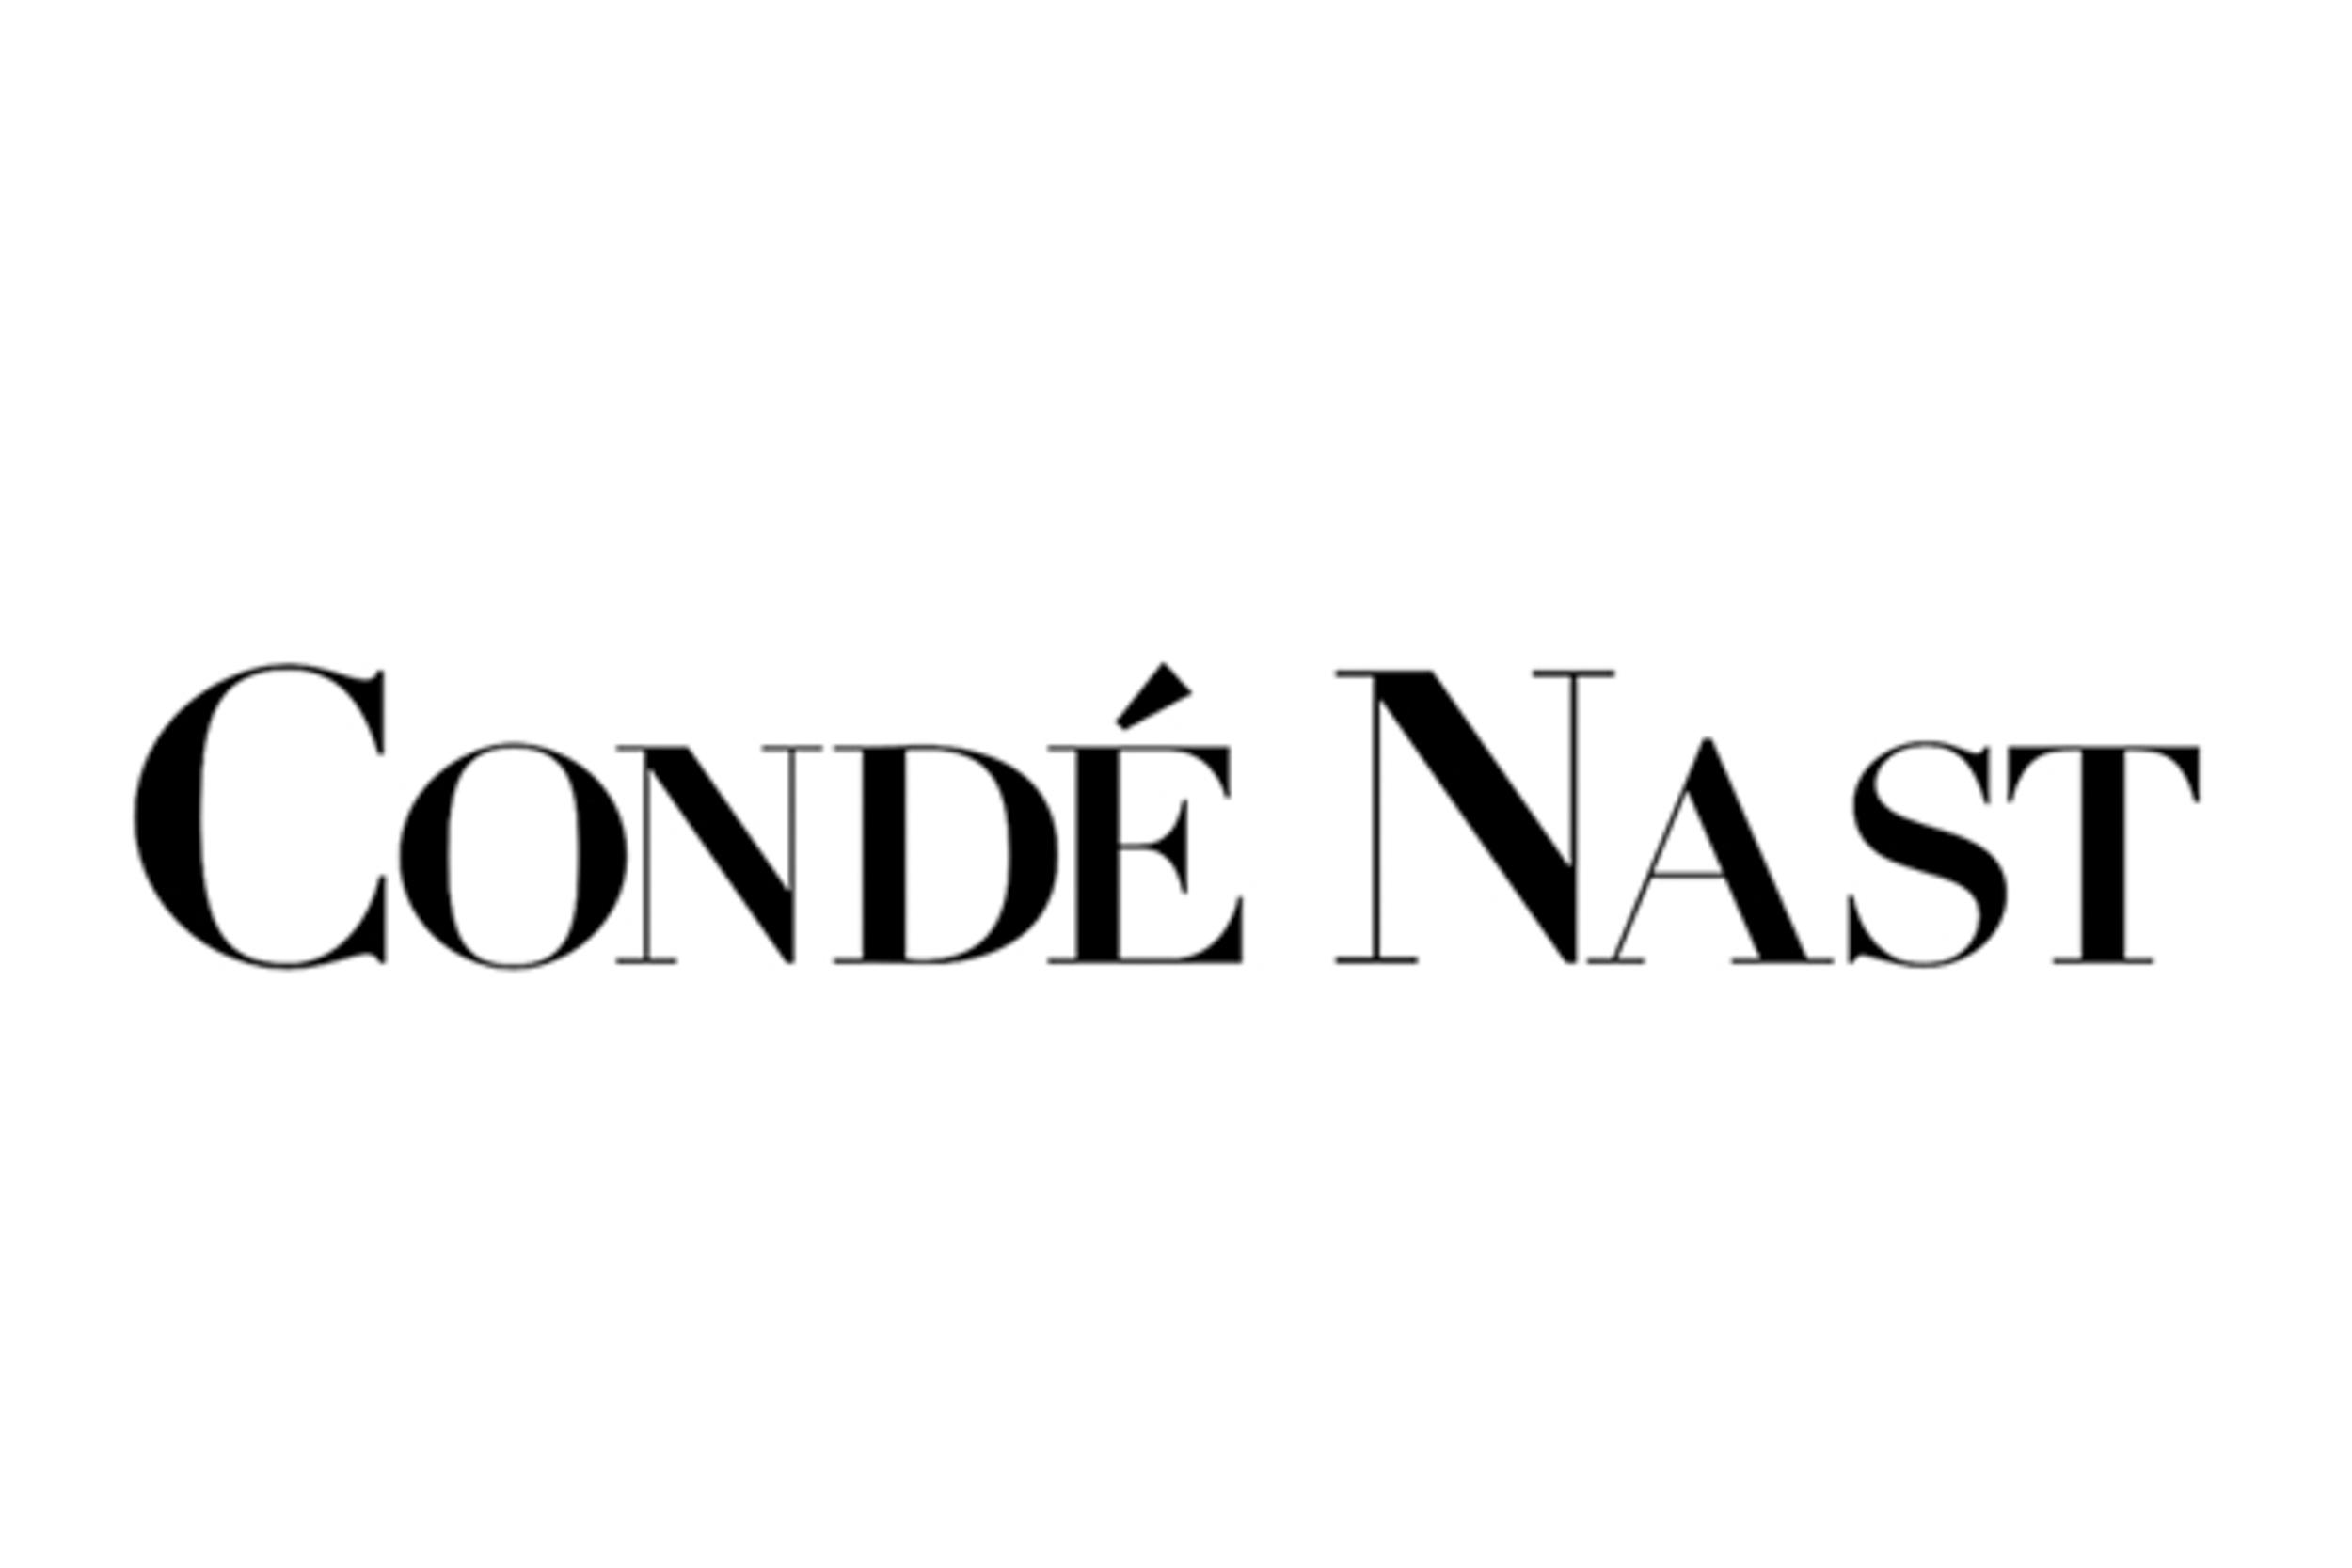 600x400_conde_nast_logo.jpg